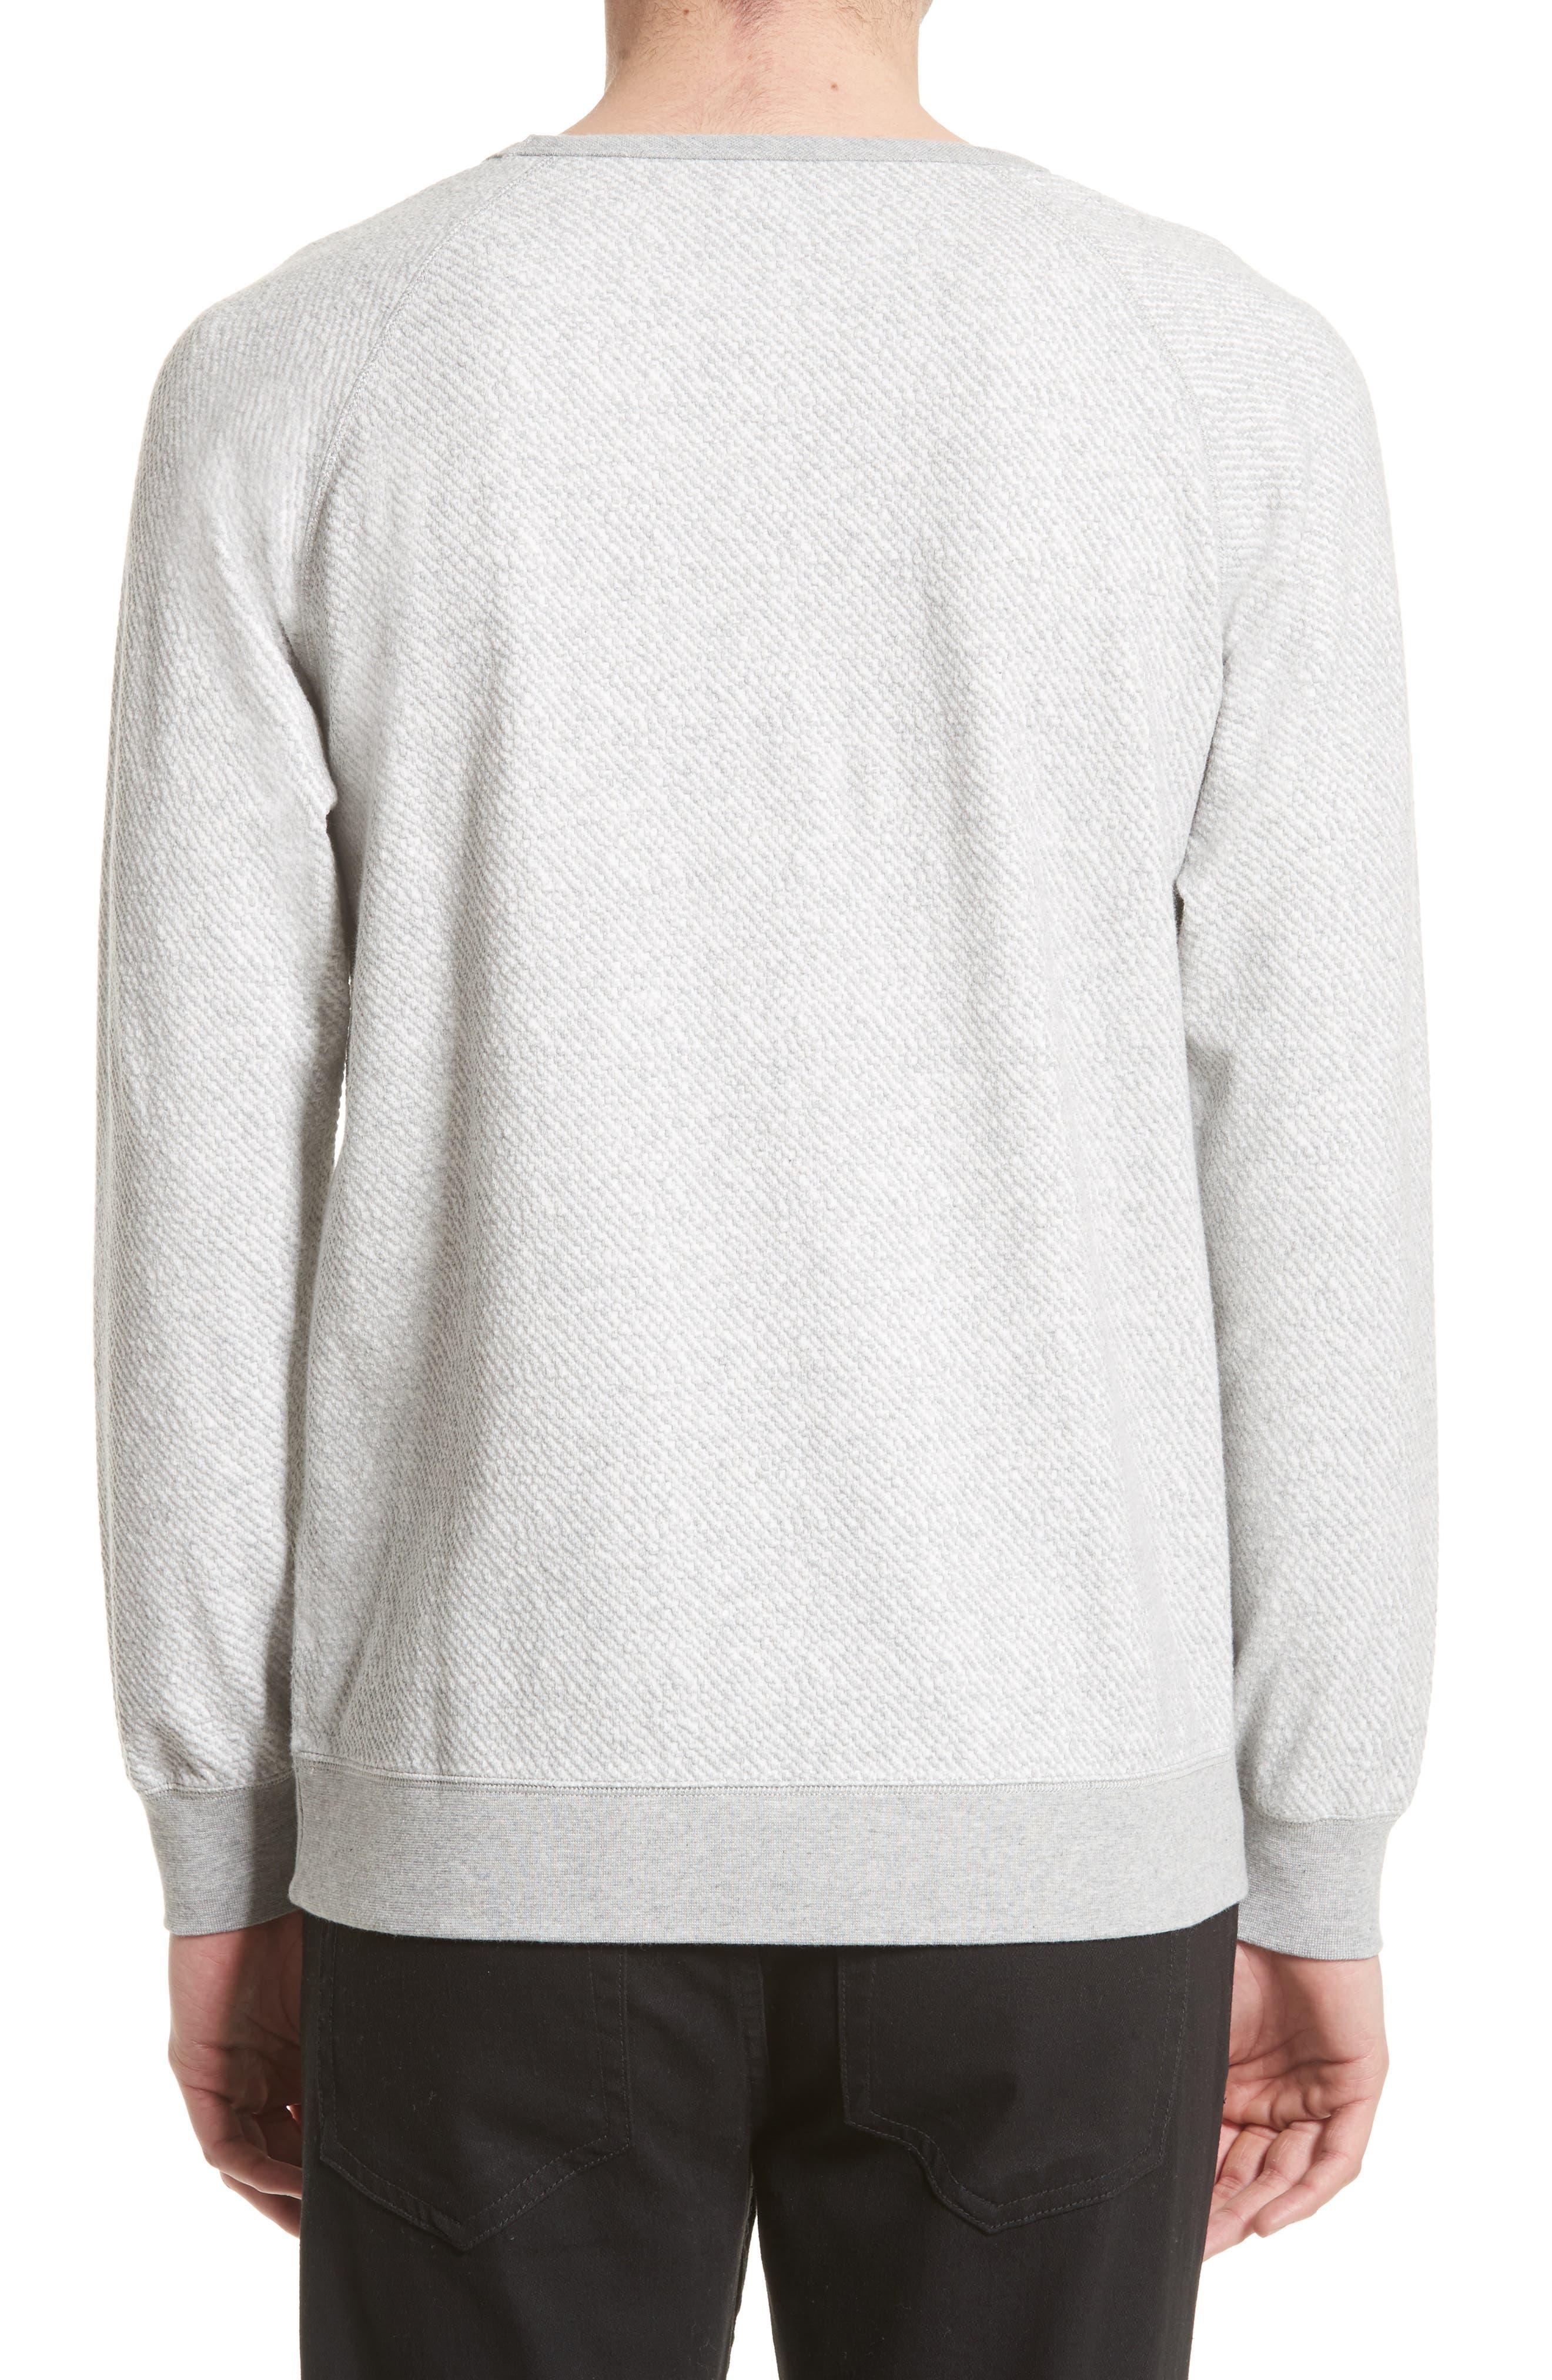 Kasu Sweater,                             Alternate thumbnail 2, color,                             035